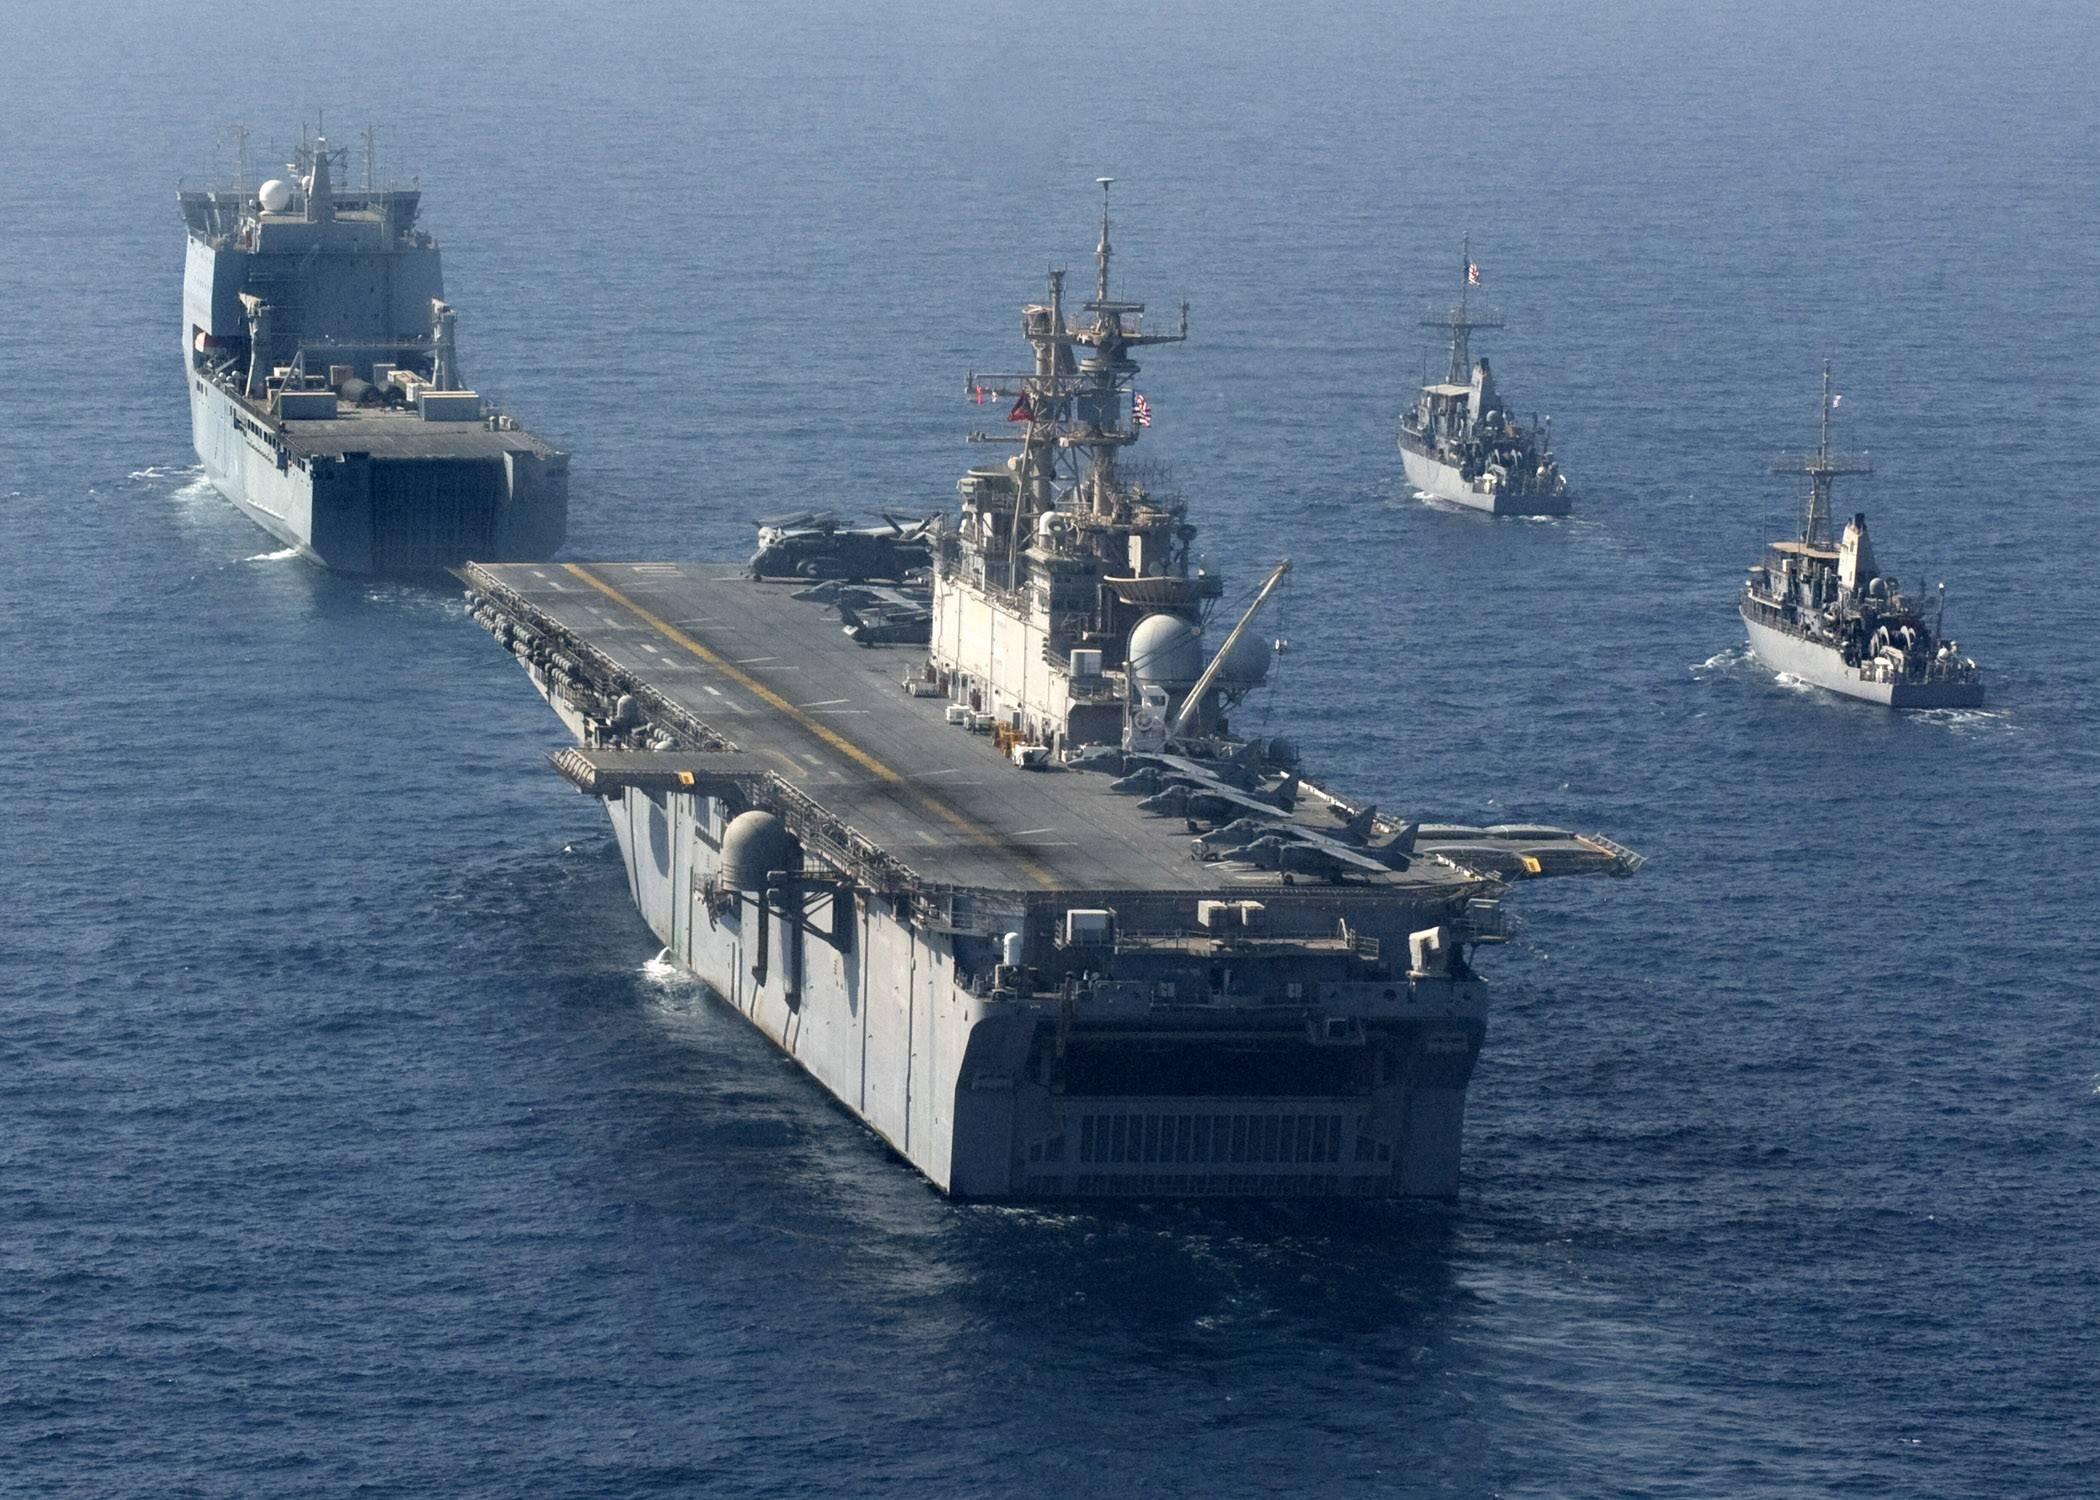 Us Navy 21001500 Wallpaper 1662093 2100x1500